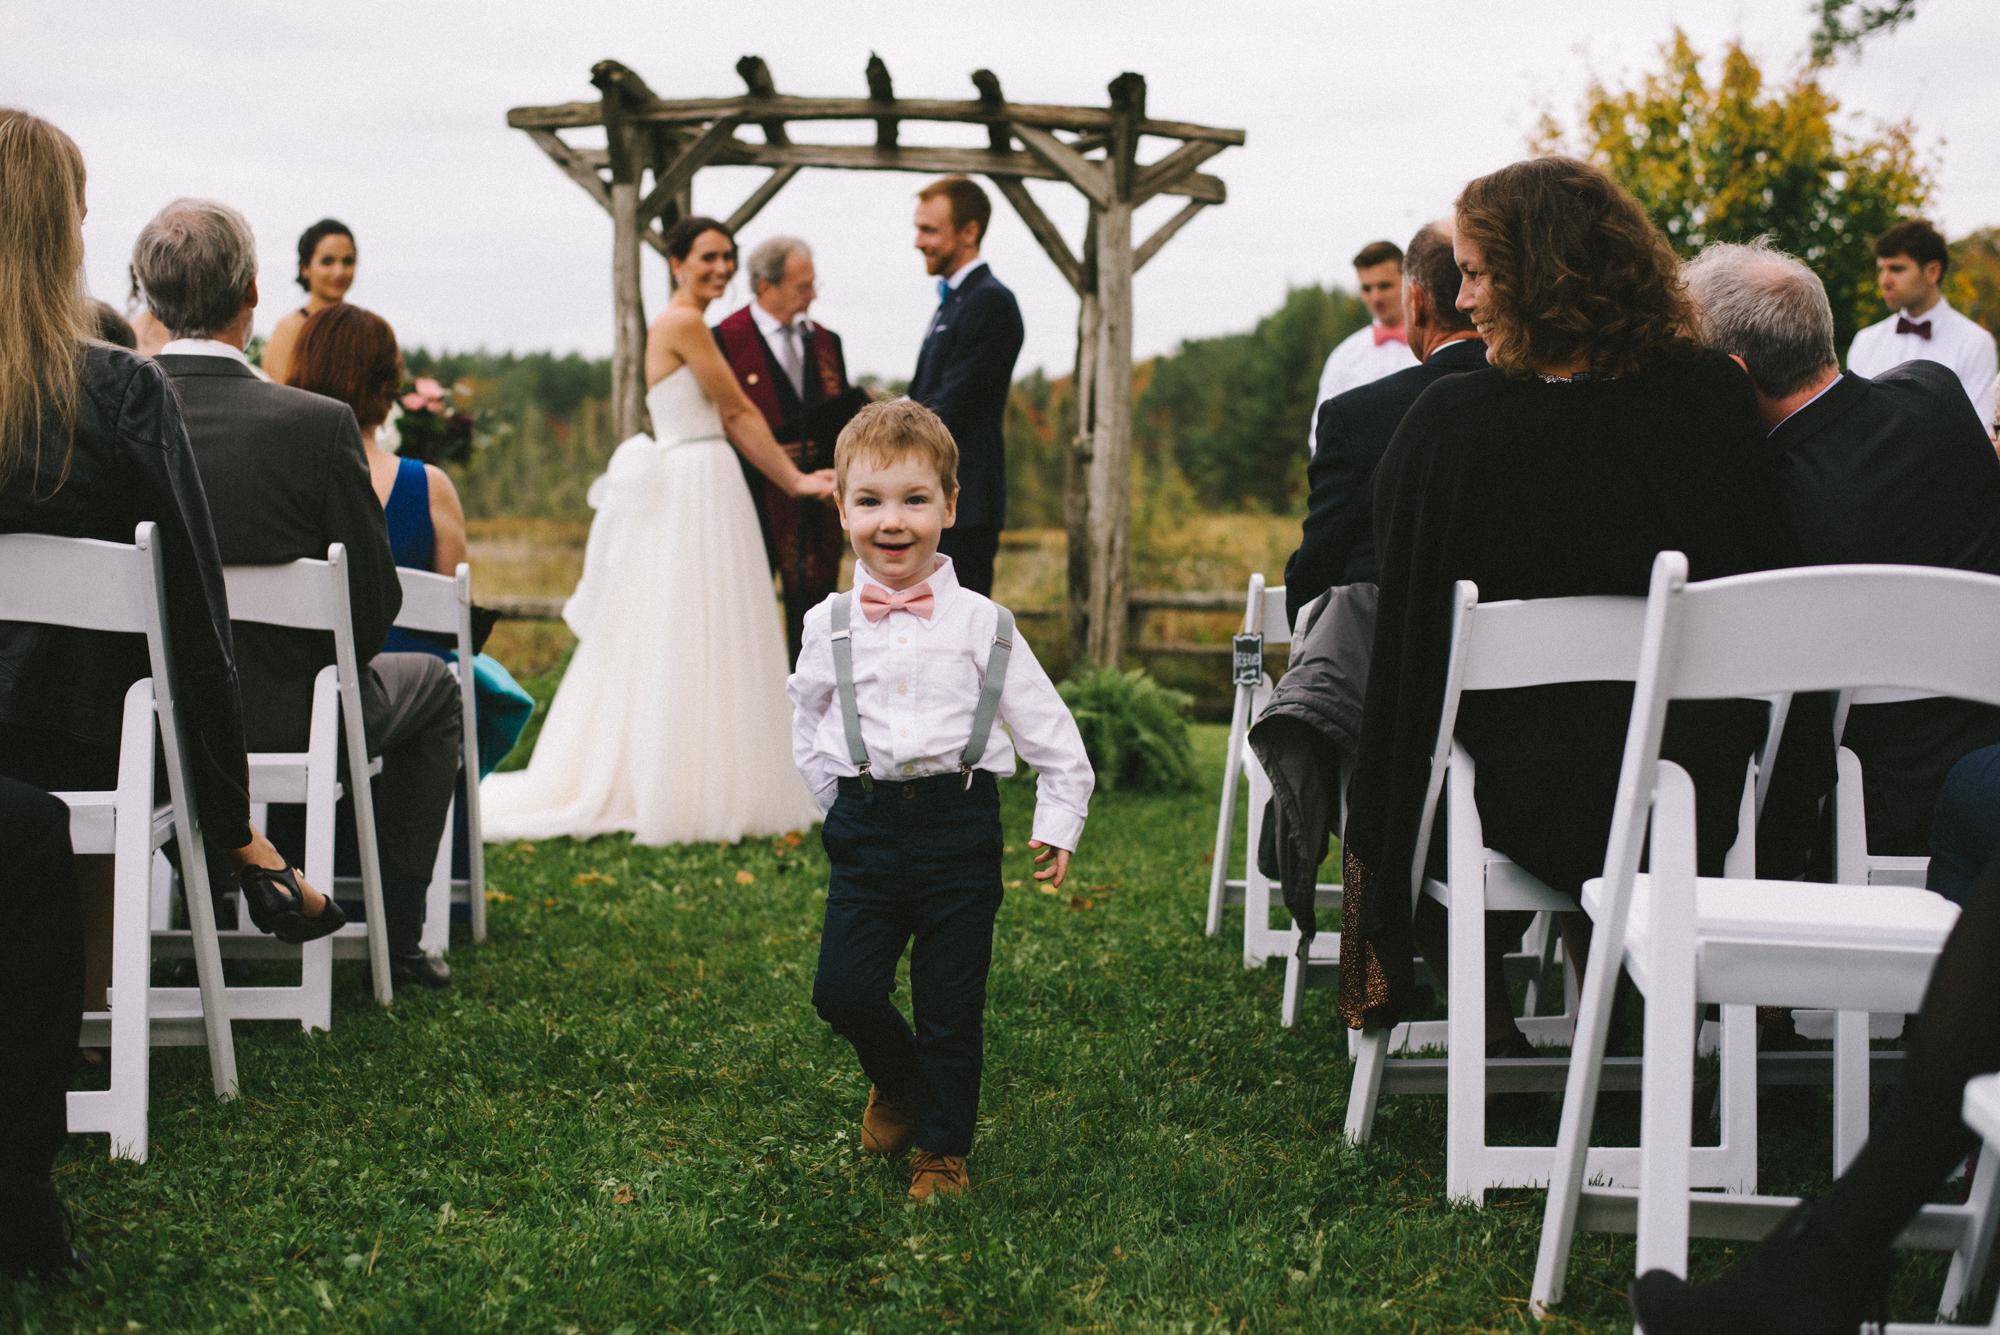 Brooklands Farm Wedding, Muskoka Wedding Photographer, Muskoka Wedding, Canadian Wedding Photographer, Ontario Wedding Photographer, Canadian Wedding Photographer, YYZ Photographer, Muskoka